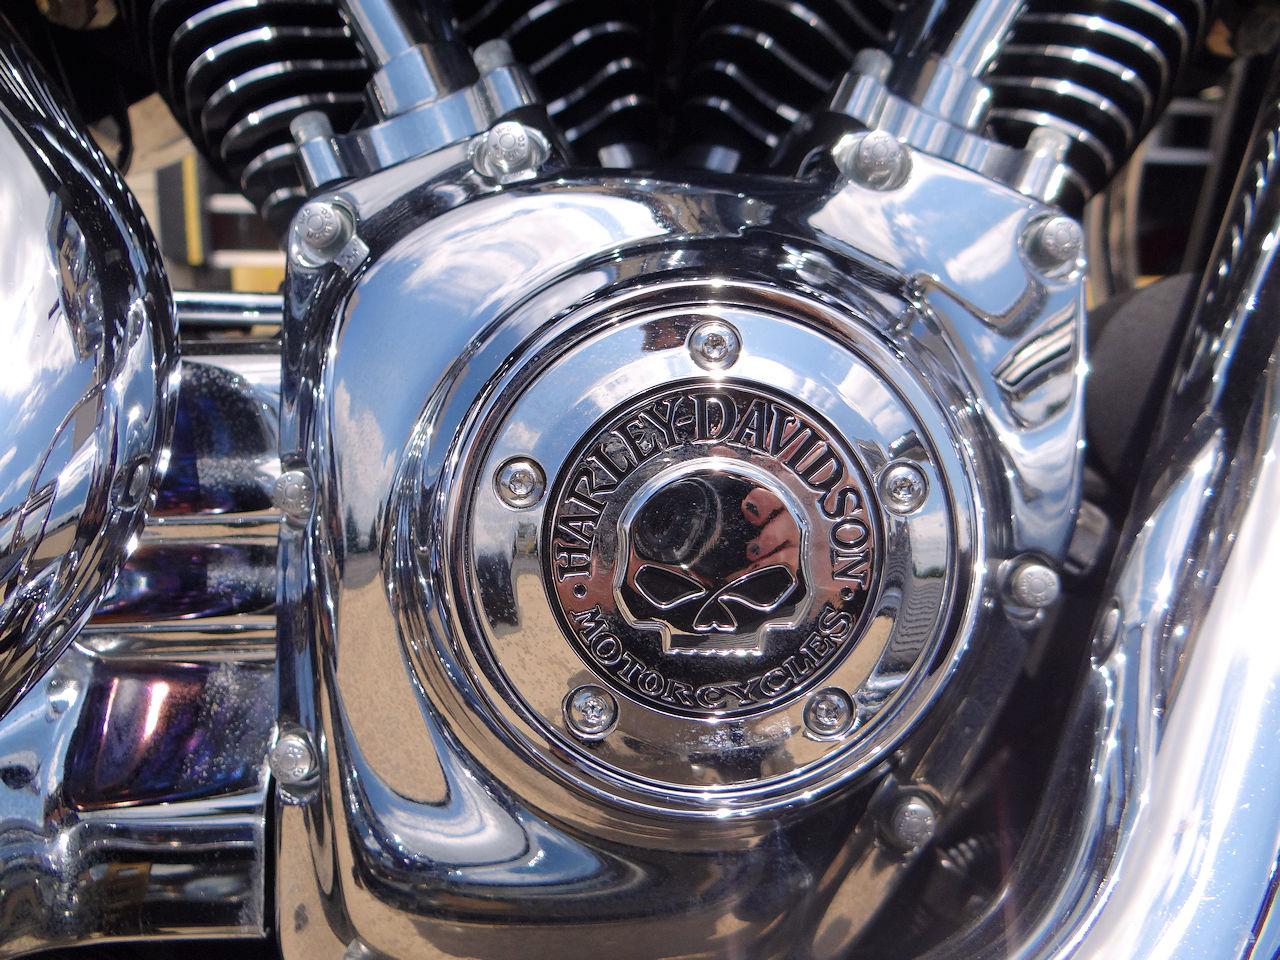 2006 Harley Davidson FLSTNI 85